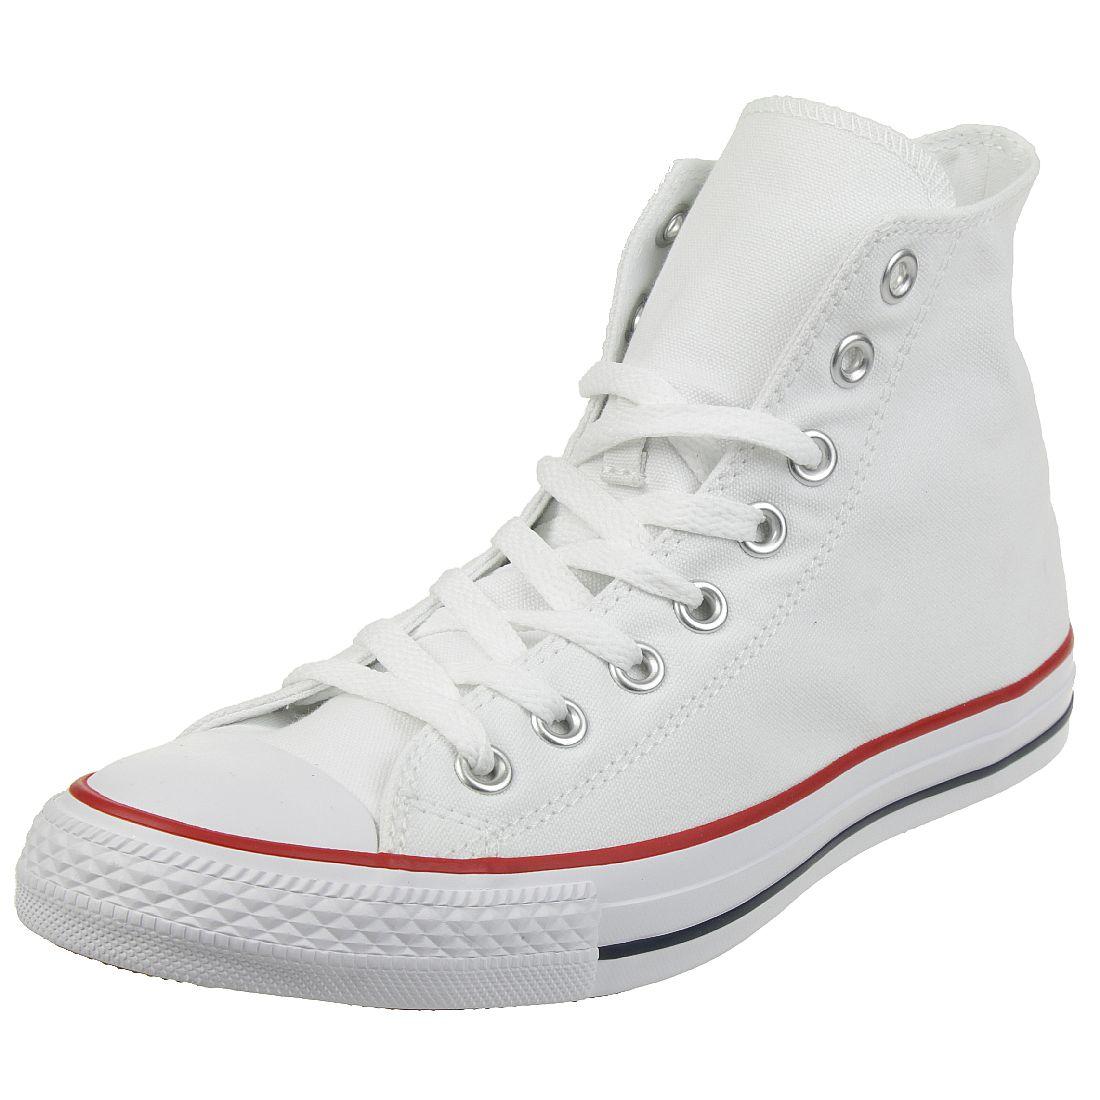 Converse C Taylor All Star HI Chuck Schuhe Sneaker canvas